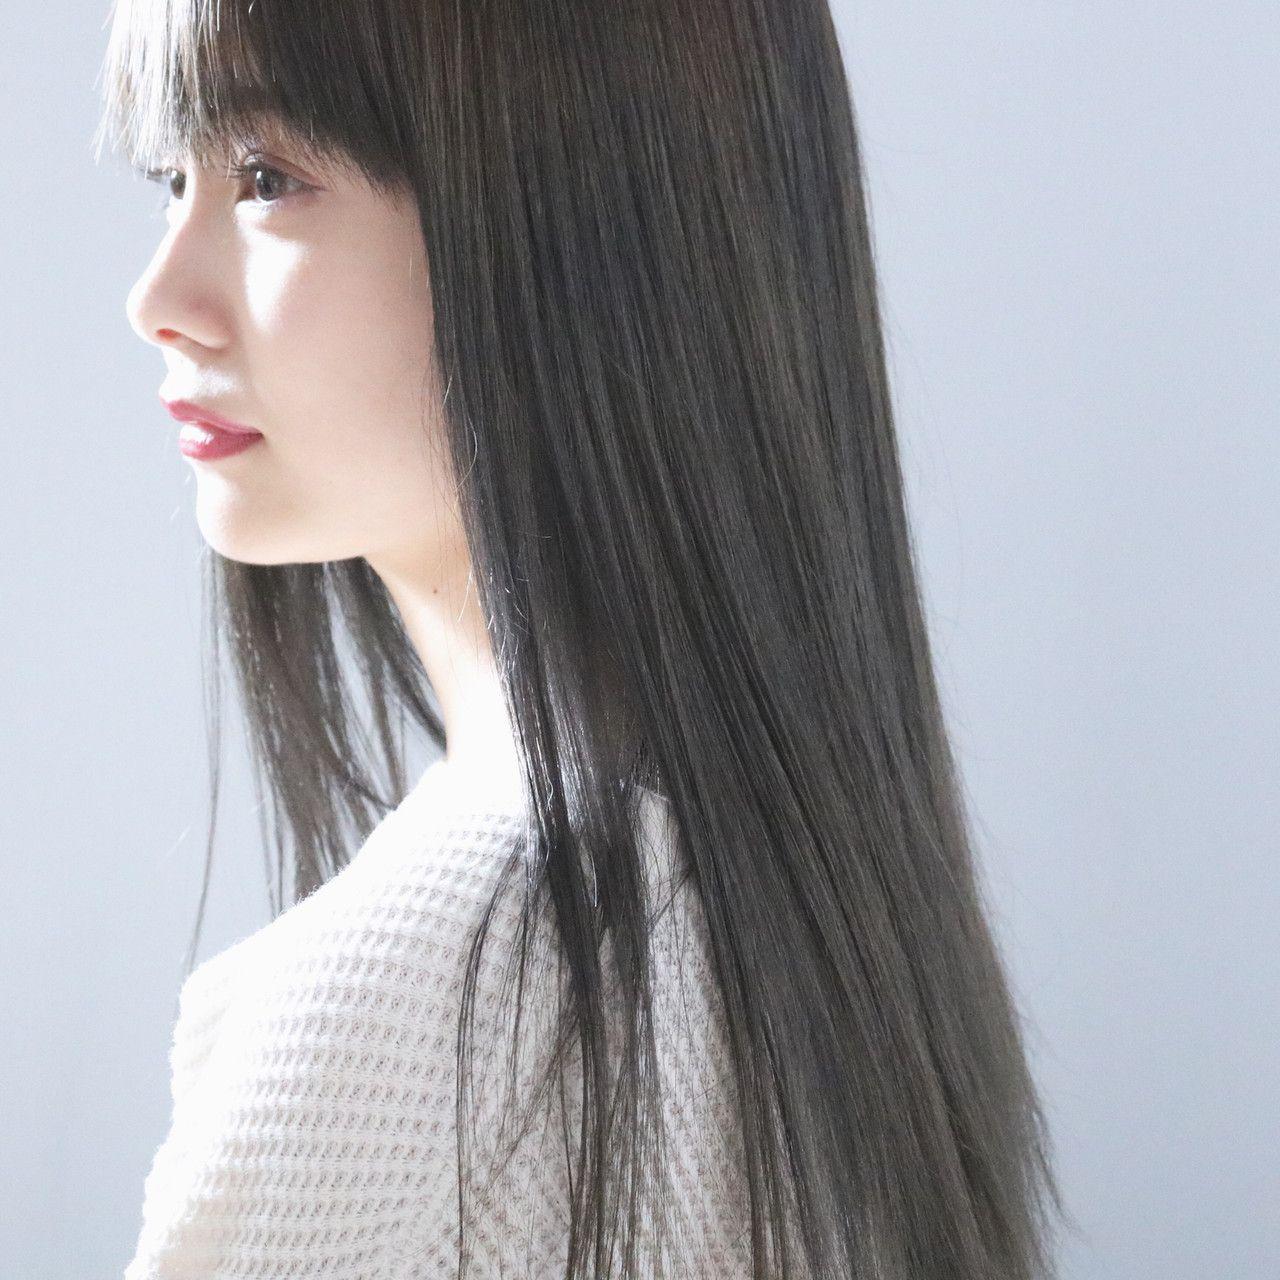 Hair 上田智久 福岡 天神さんのヘアスタイルスナップ Id 430829